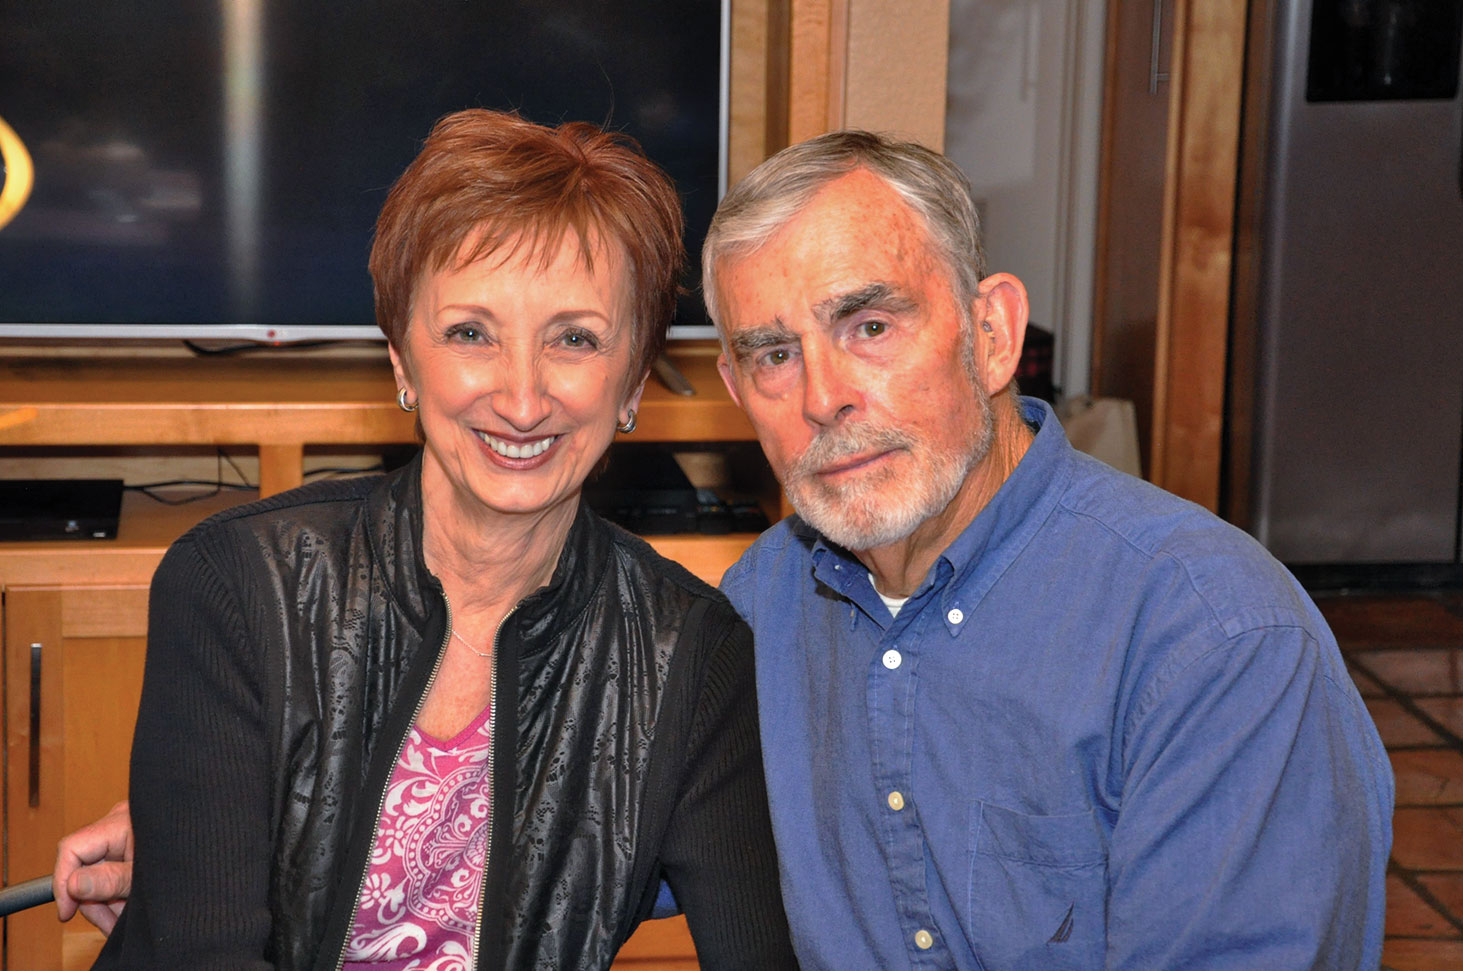 Venera and Richard Monahan on their 50th wedding anniversary